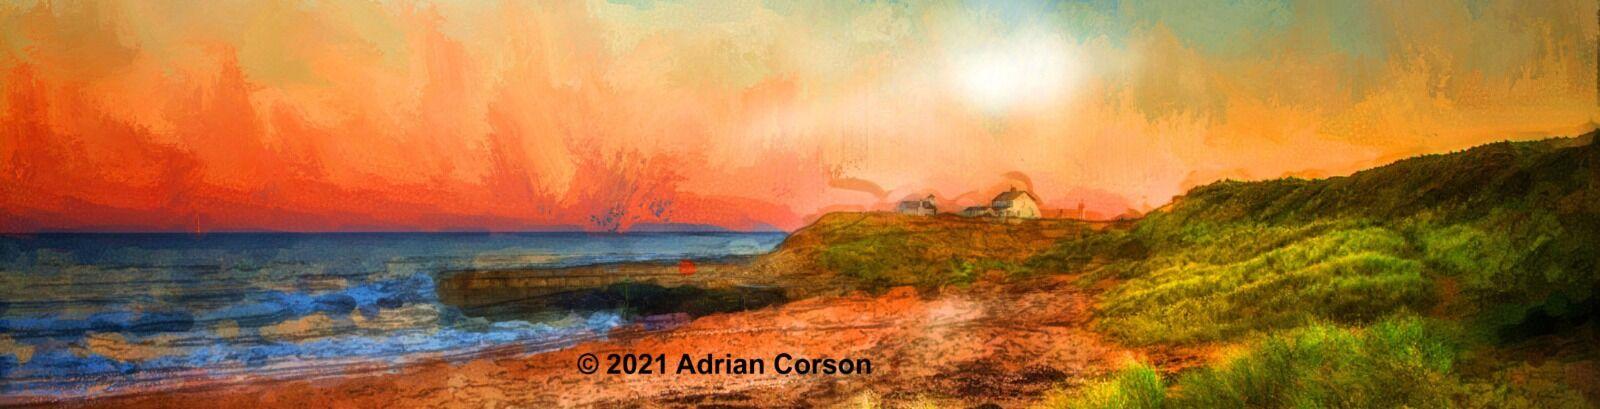 161-sandunes sea and sunset